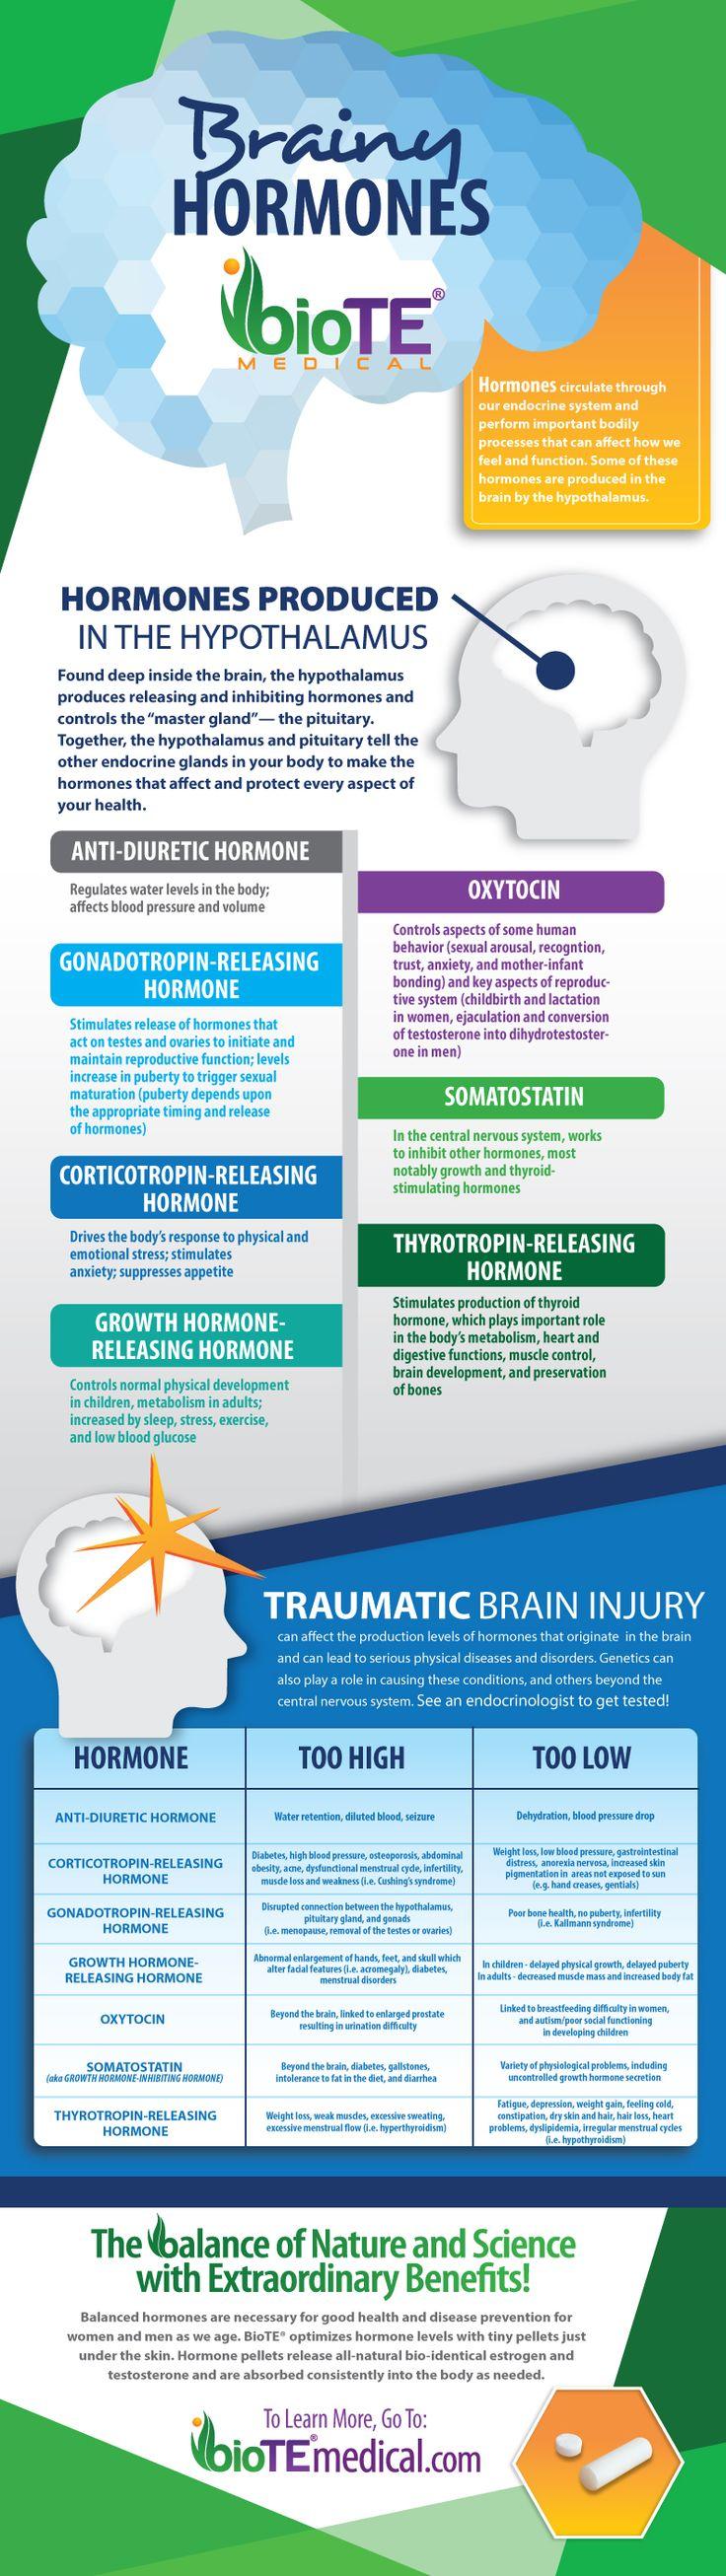 Hypothalamus hormones